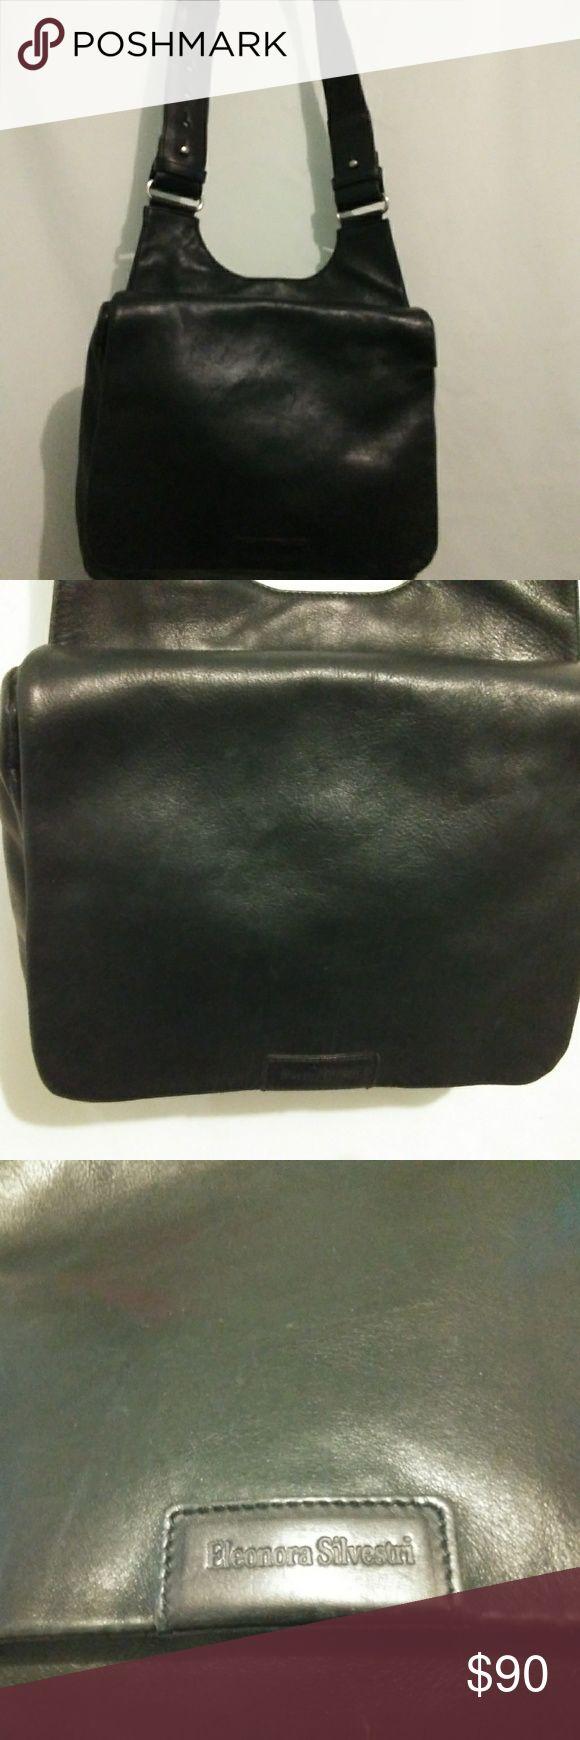 EUC ELEONORA SILVESTRI CALF LEATHER SHOULDER BAG Super soft leather!!  From Spain eleonora silvestri Bags Shoulder Bags